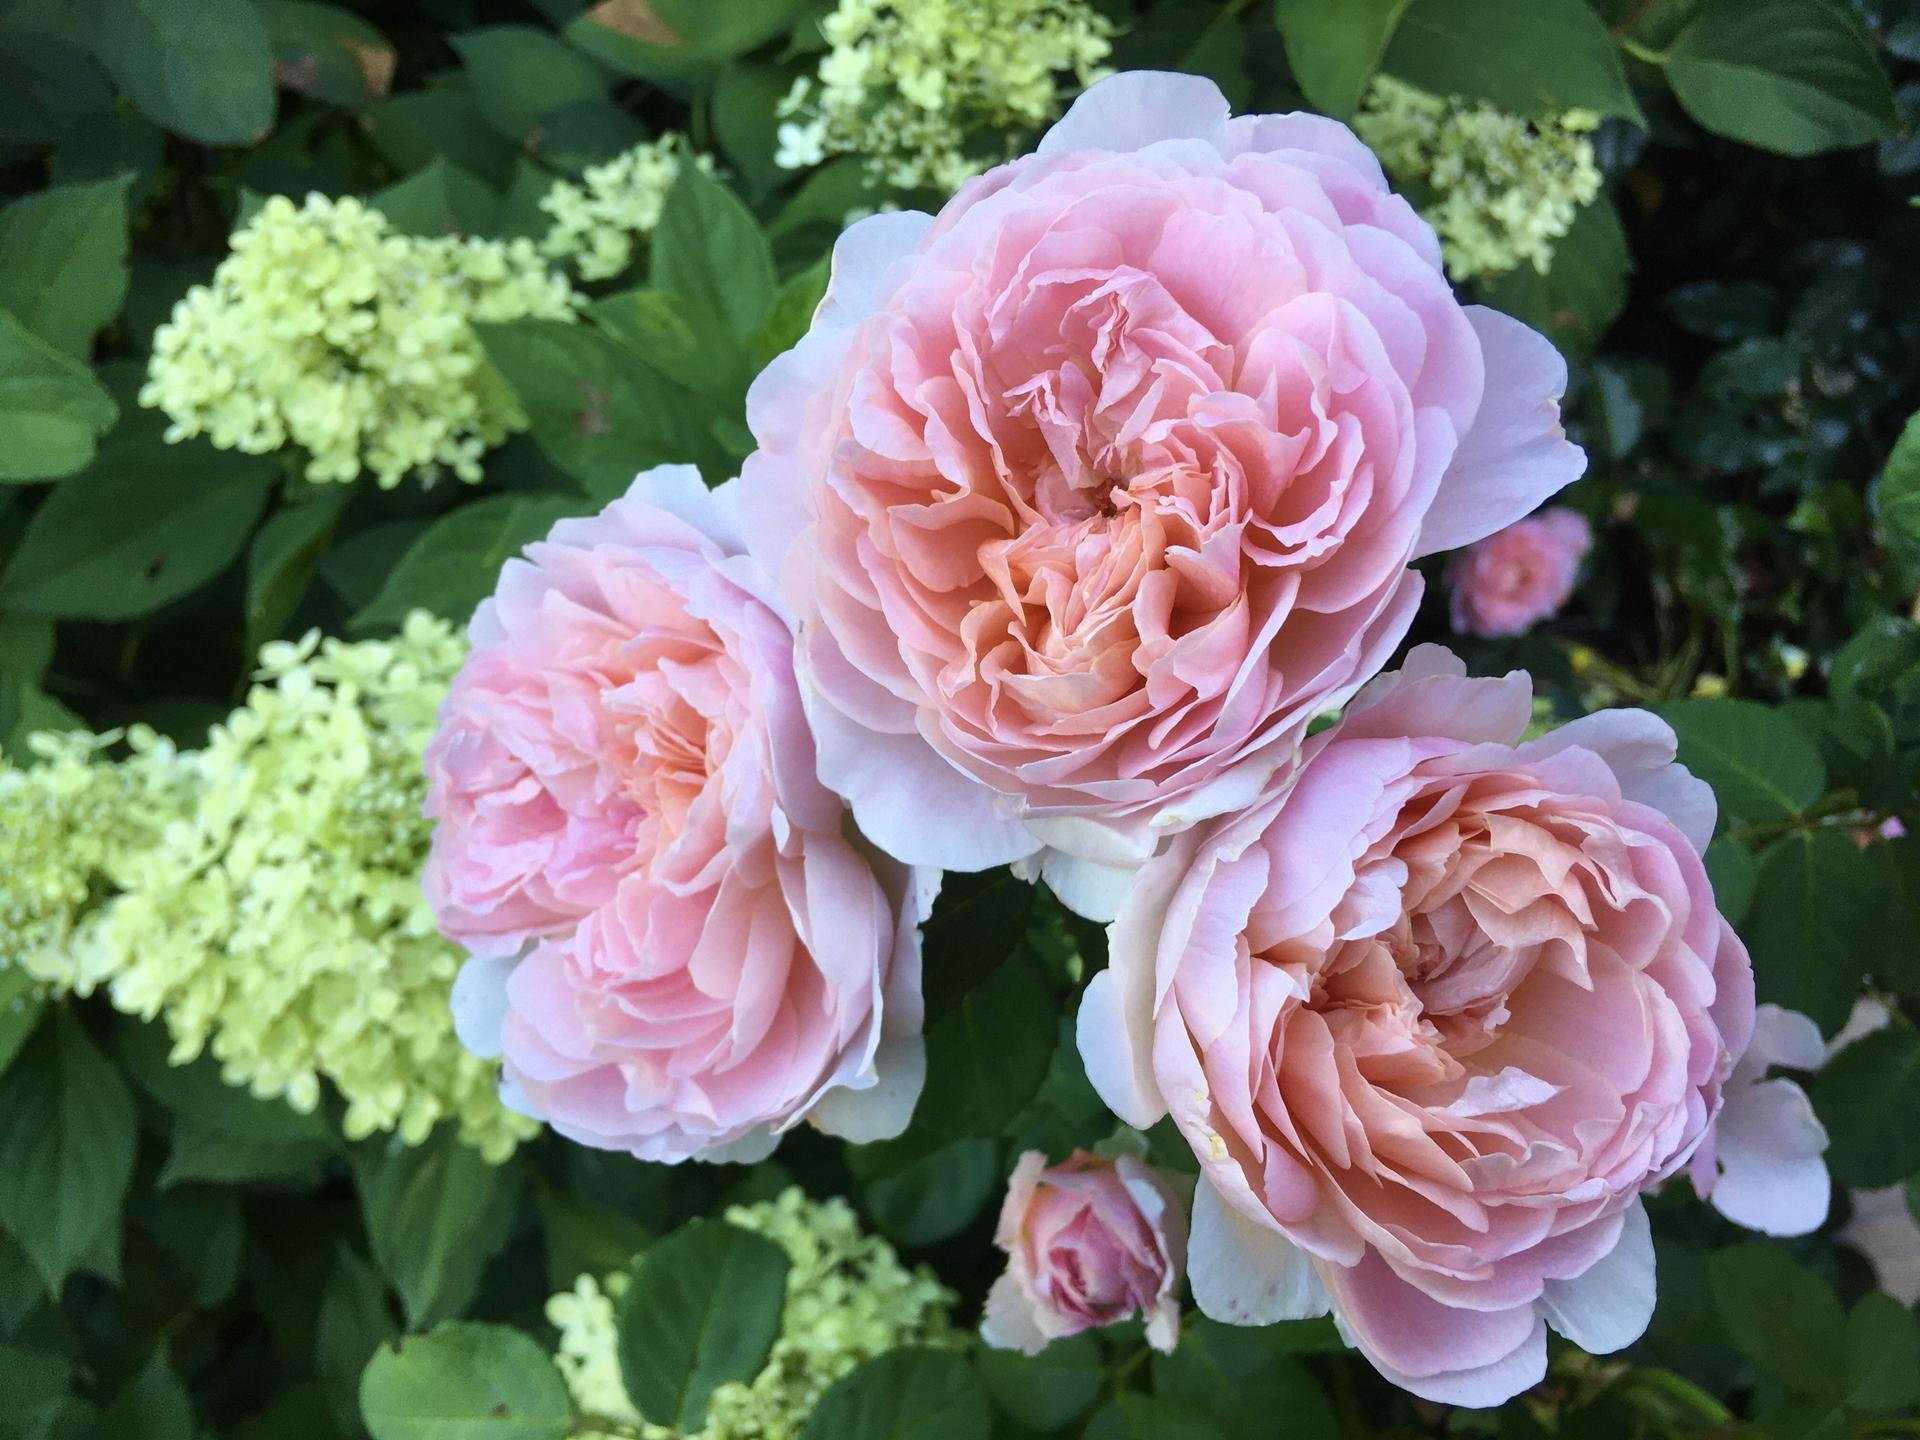 Zahrada 2020 - Eustacia Vye a hortenzi3 latnata Limelight